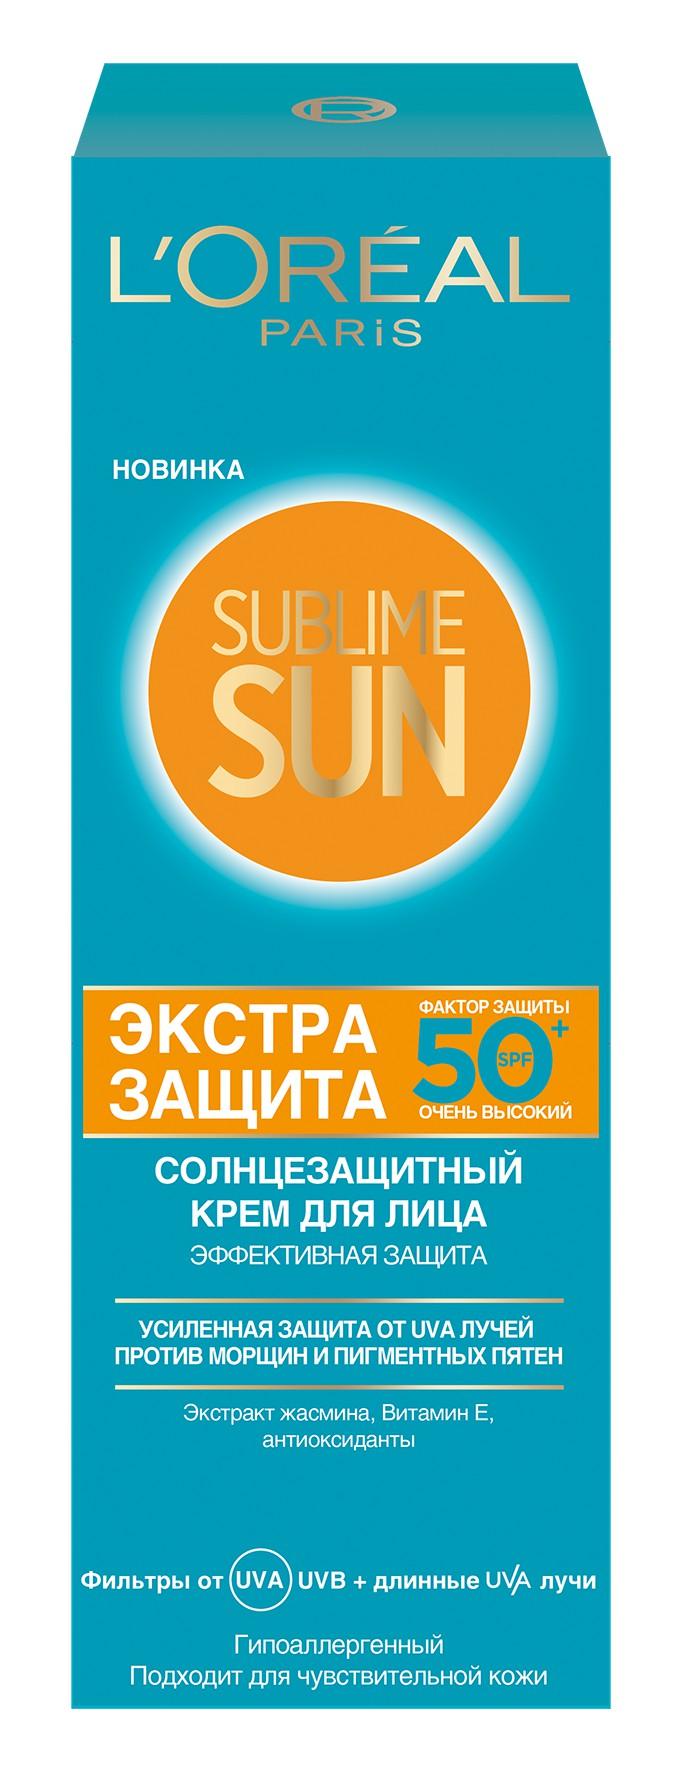 "L'Oreal Paris Sublime Sun Крем для лица ""Экстра защита"", солнцезащитный, SPF 50+, 75 мл"